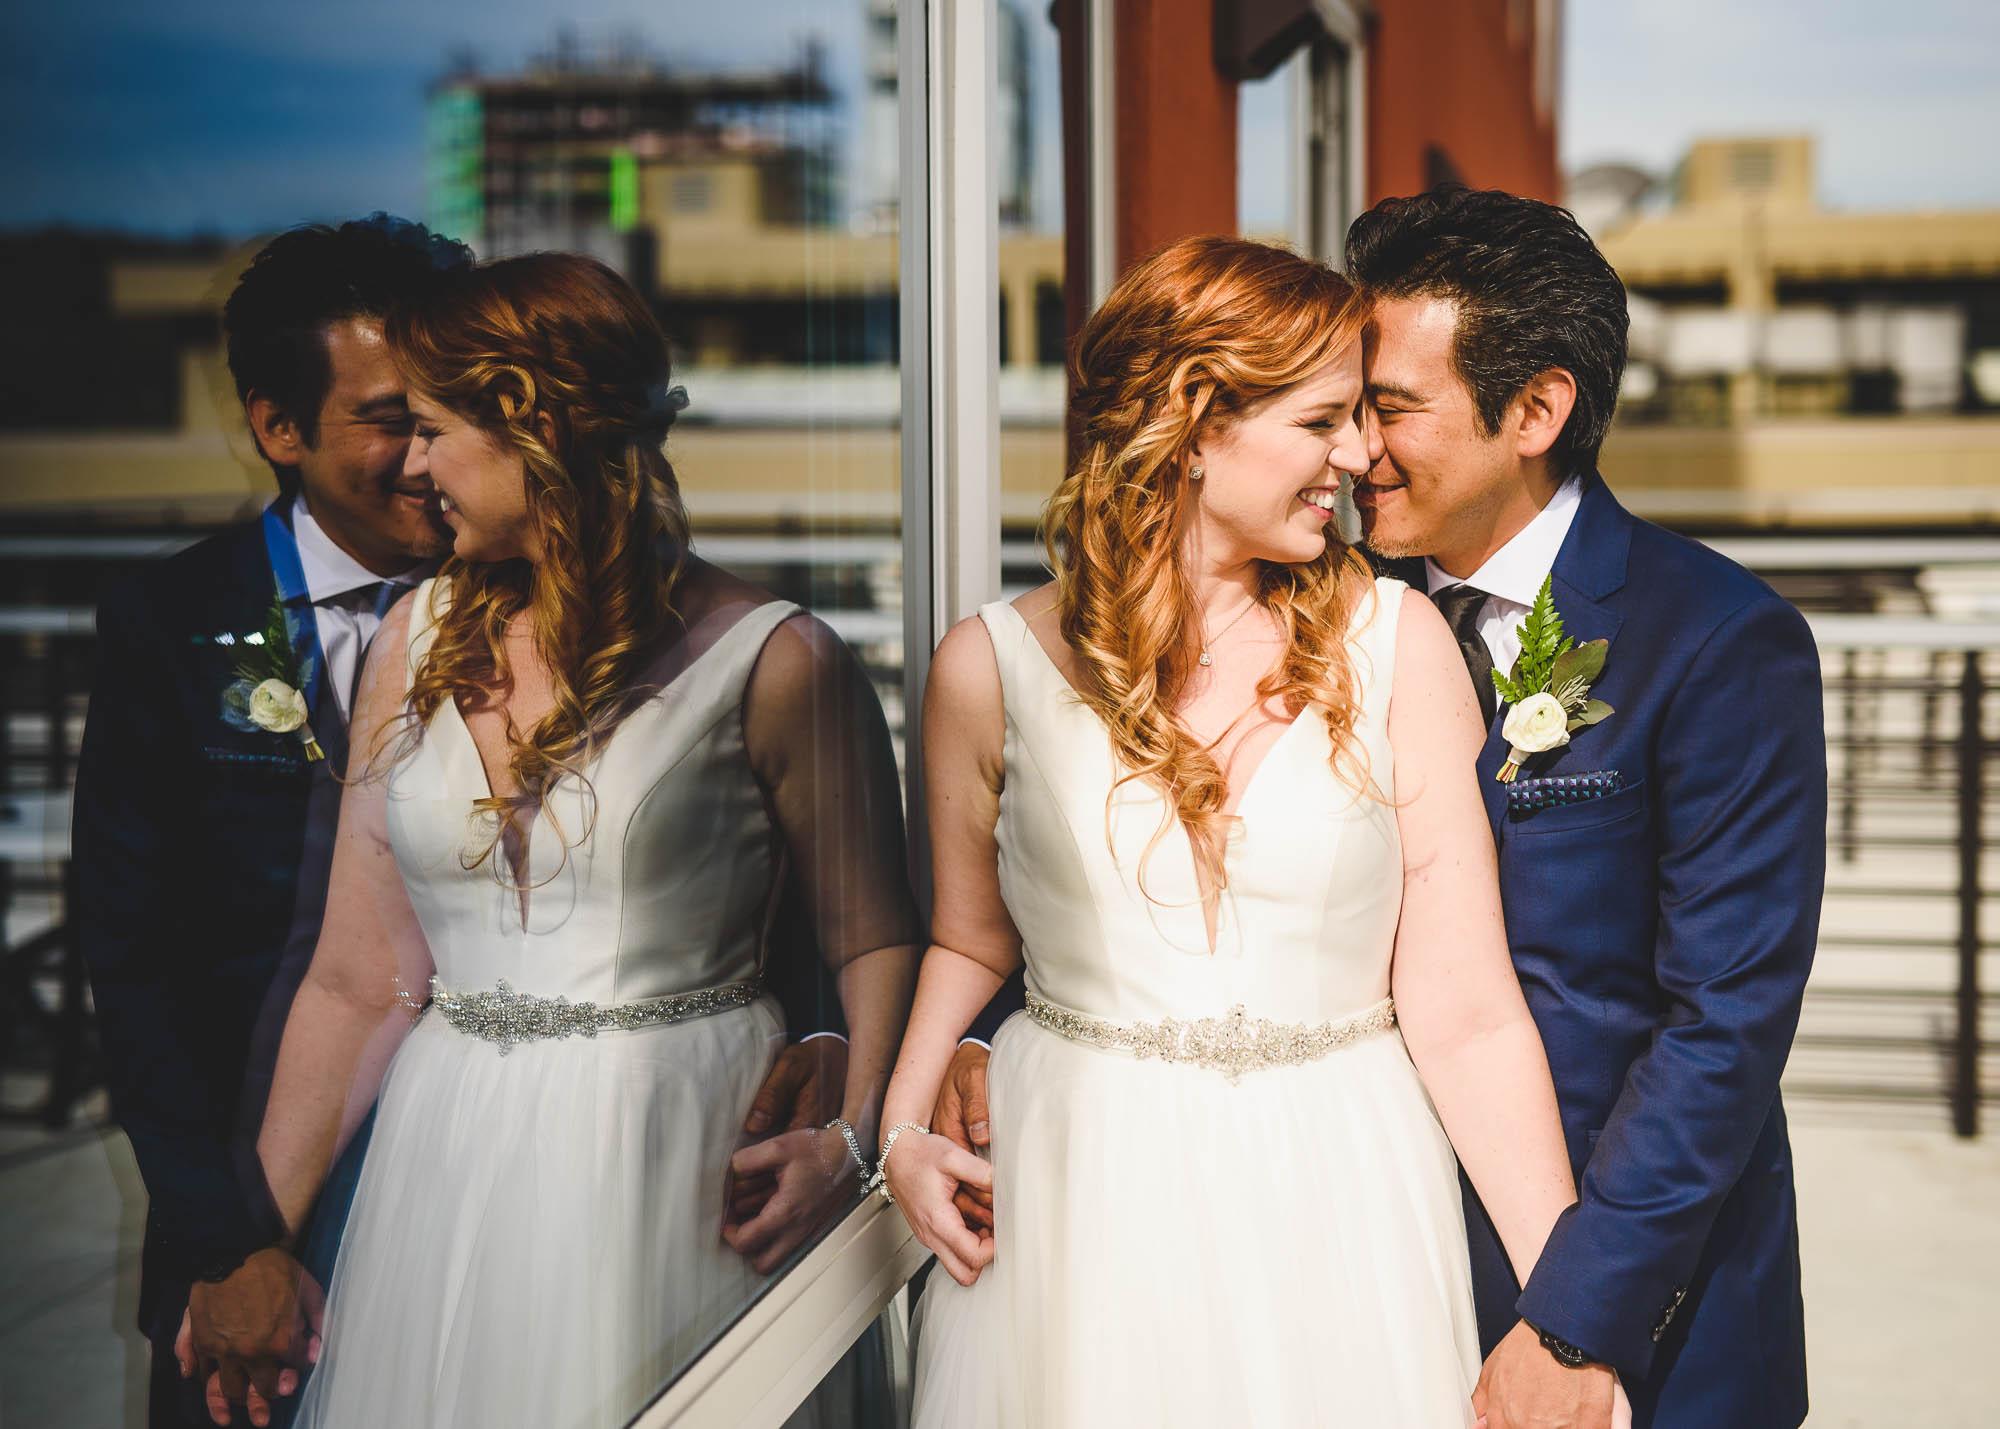 Cambria weddings